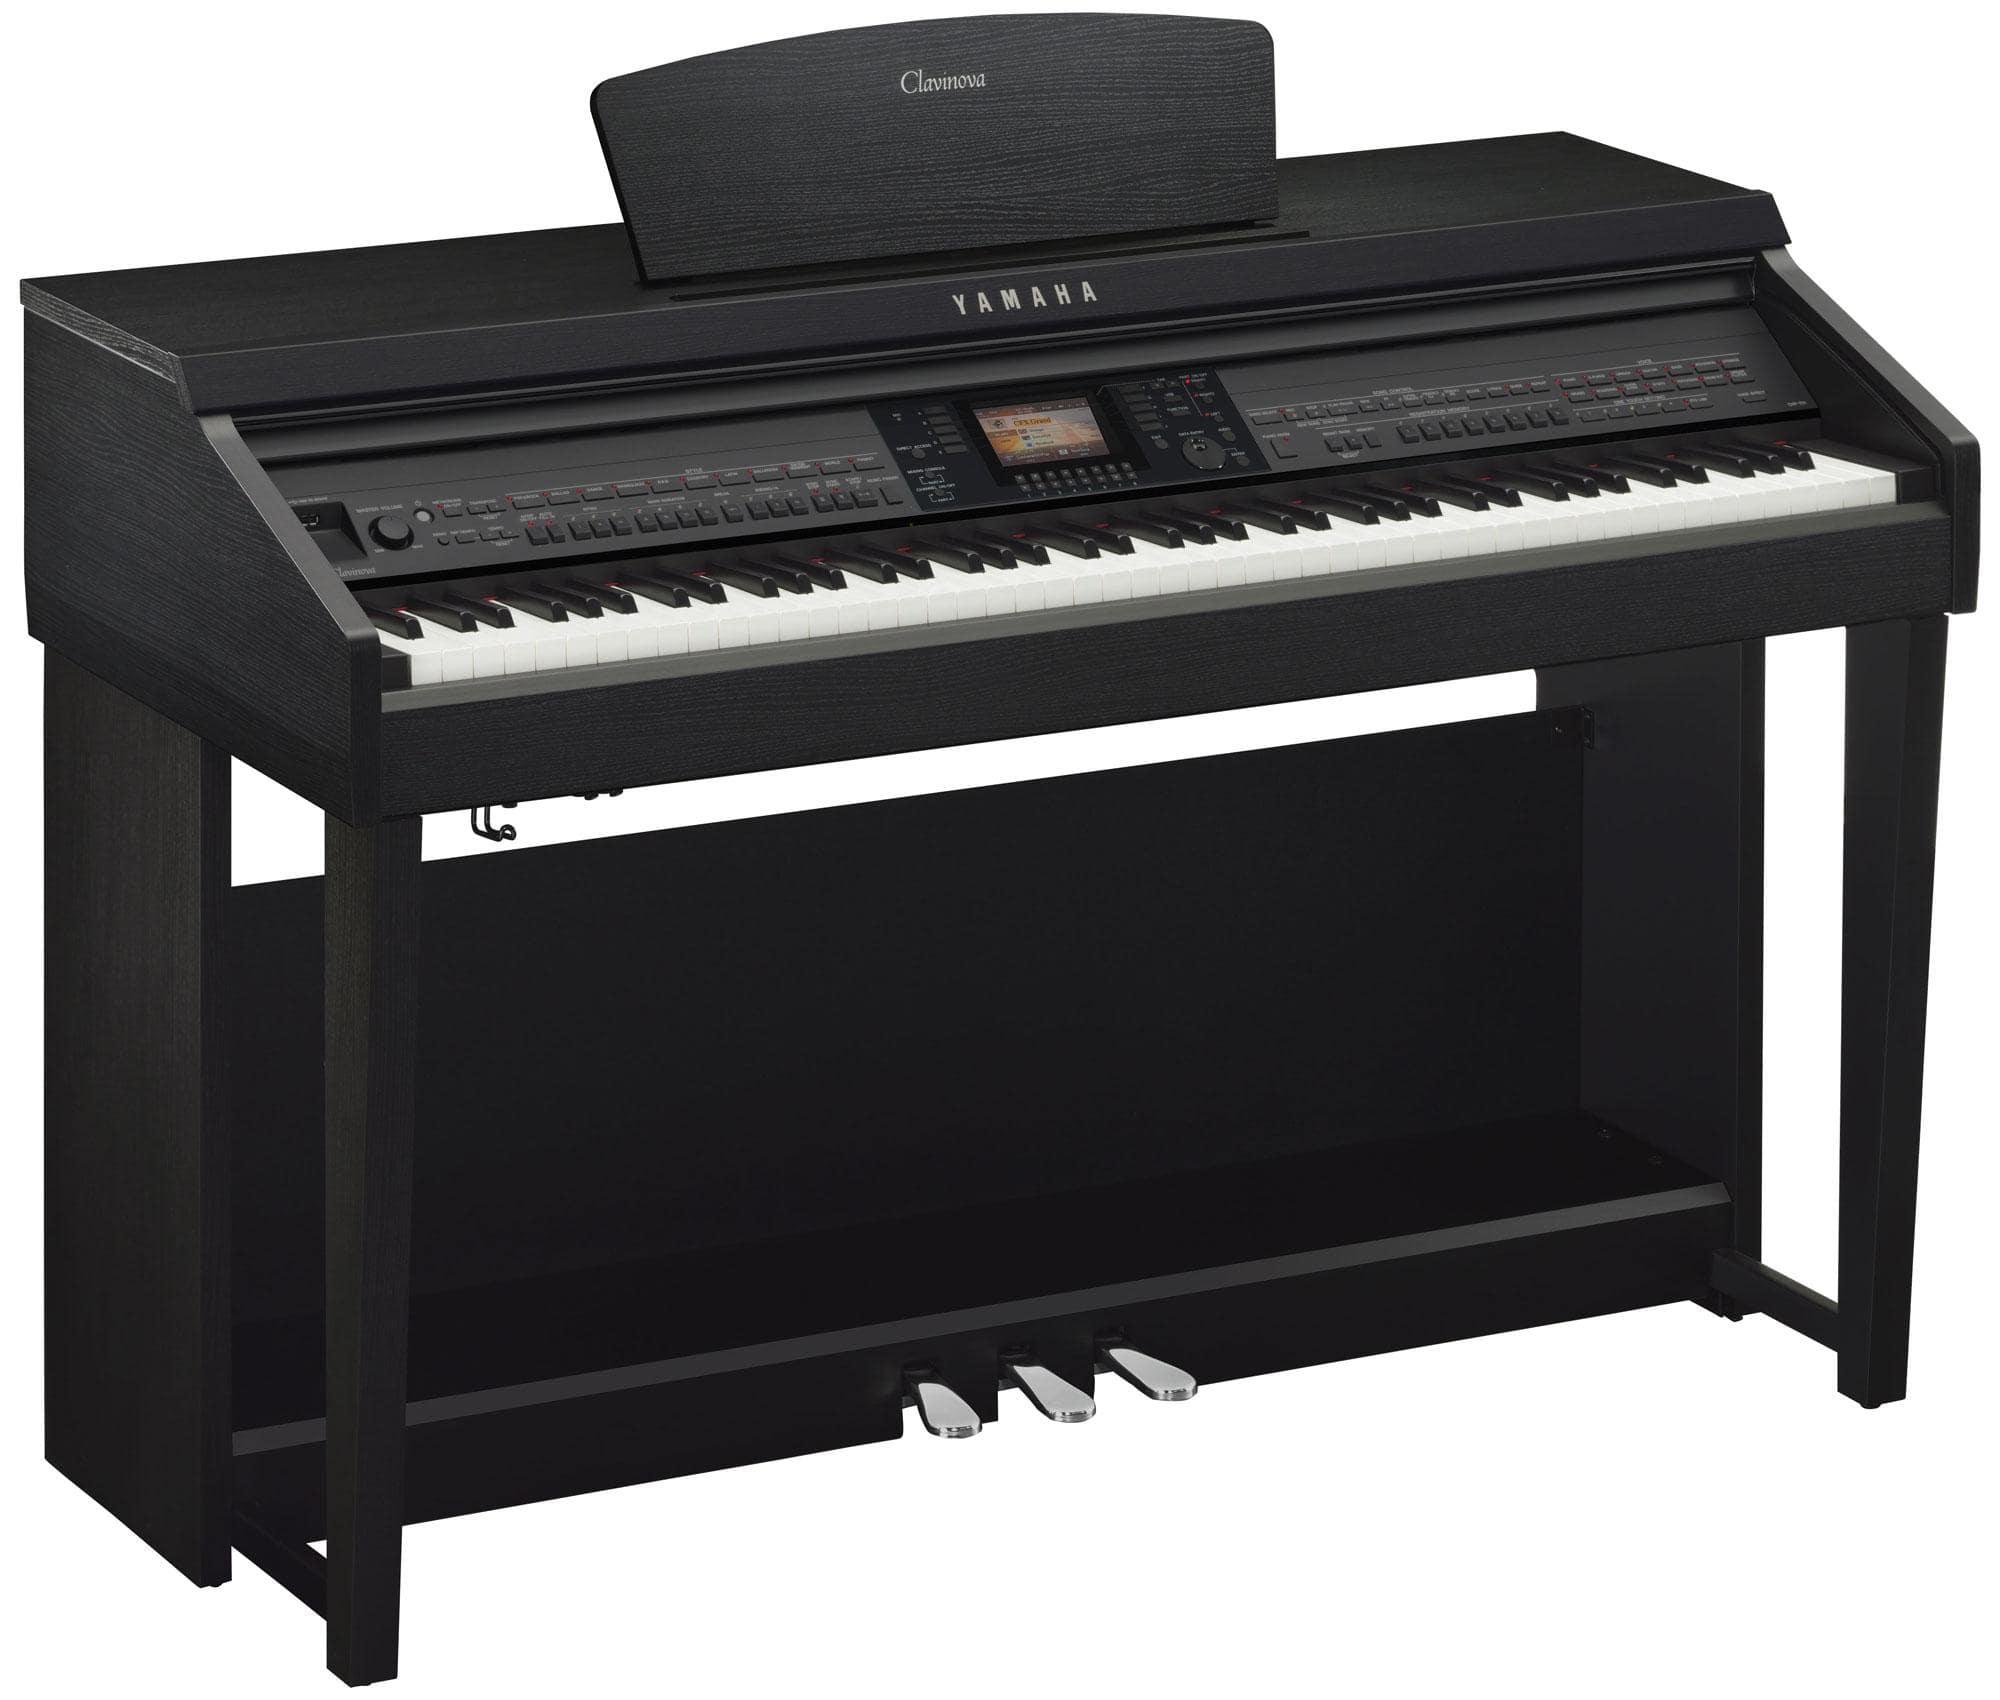 Yamaha CVP 701 B Clavinova Digitalpiano Schwarz Matt